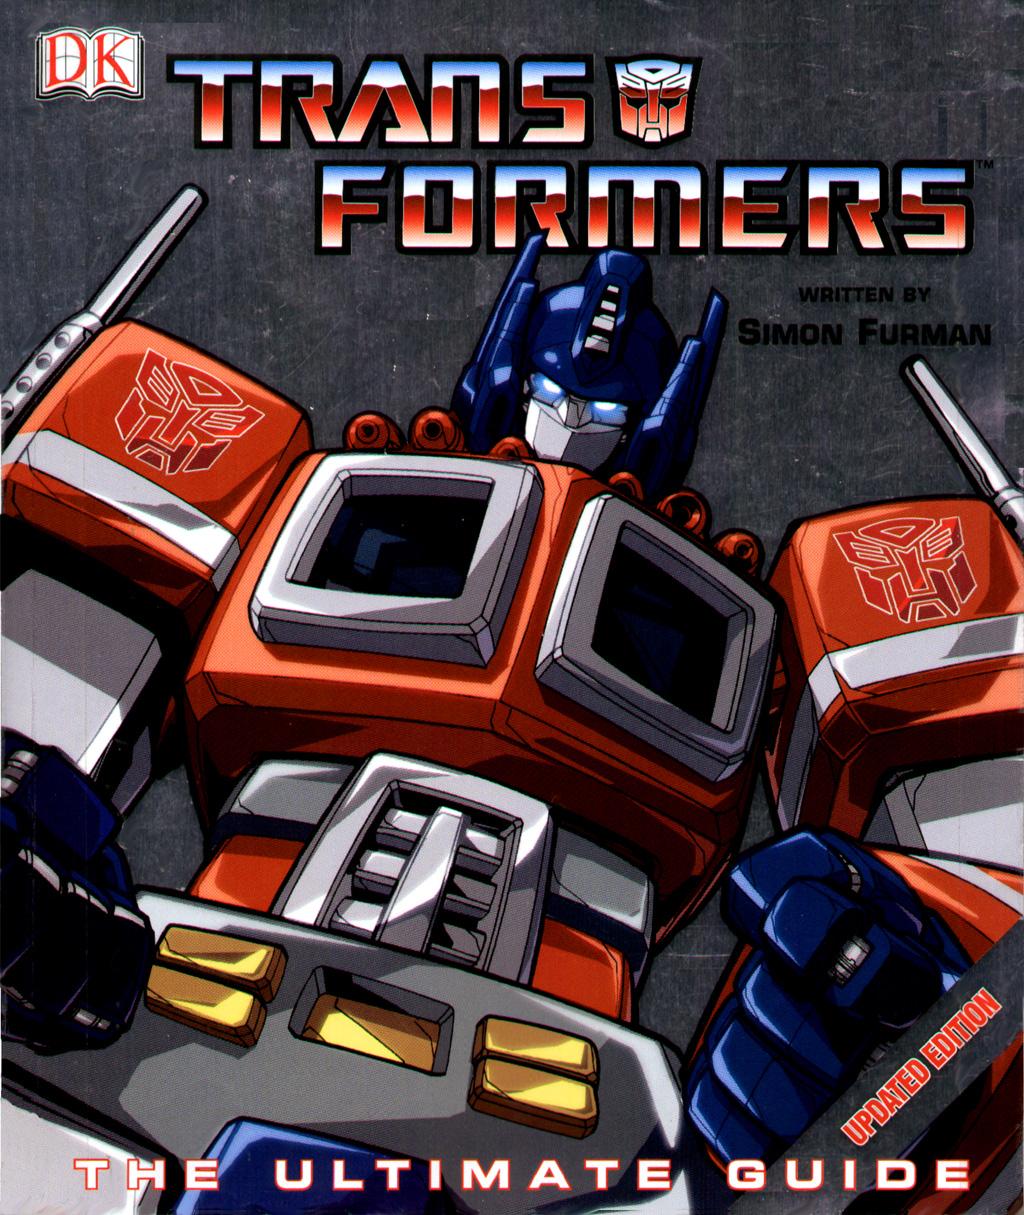 Transformers Ultimate Guide Book - WordPress.com